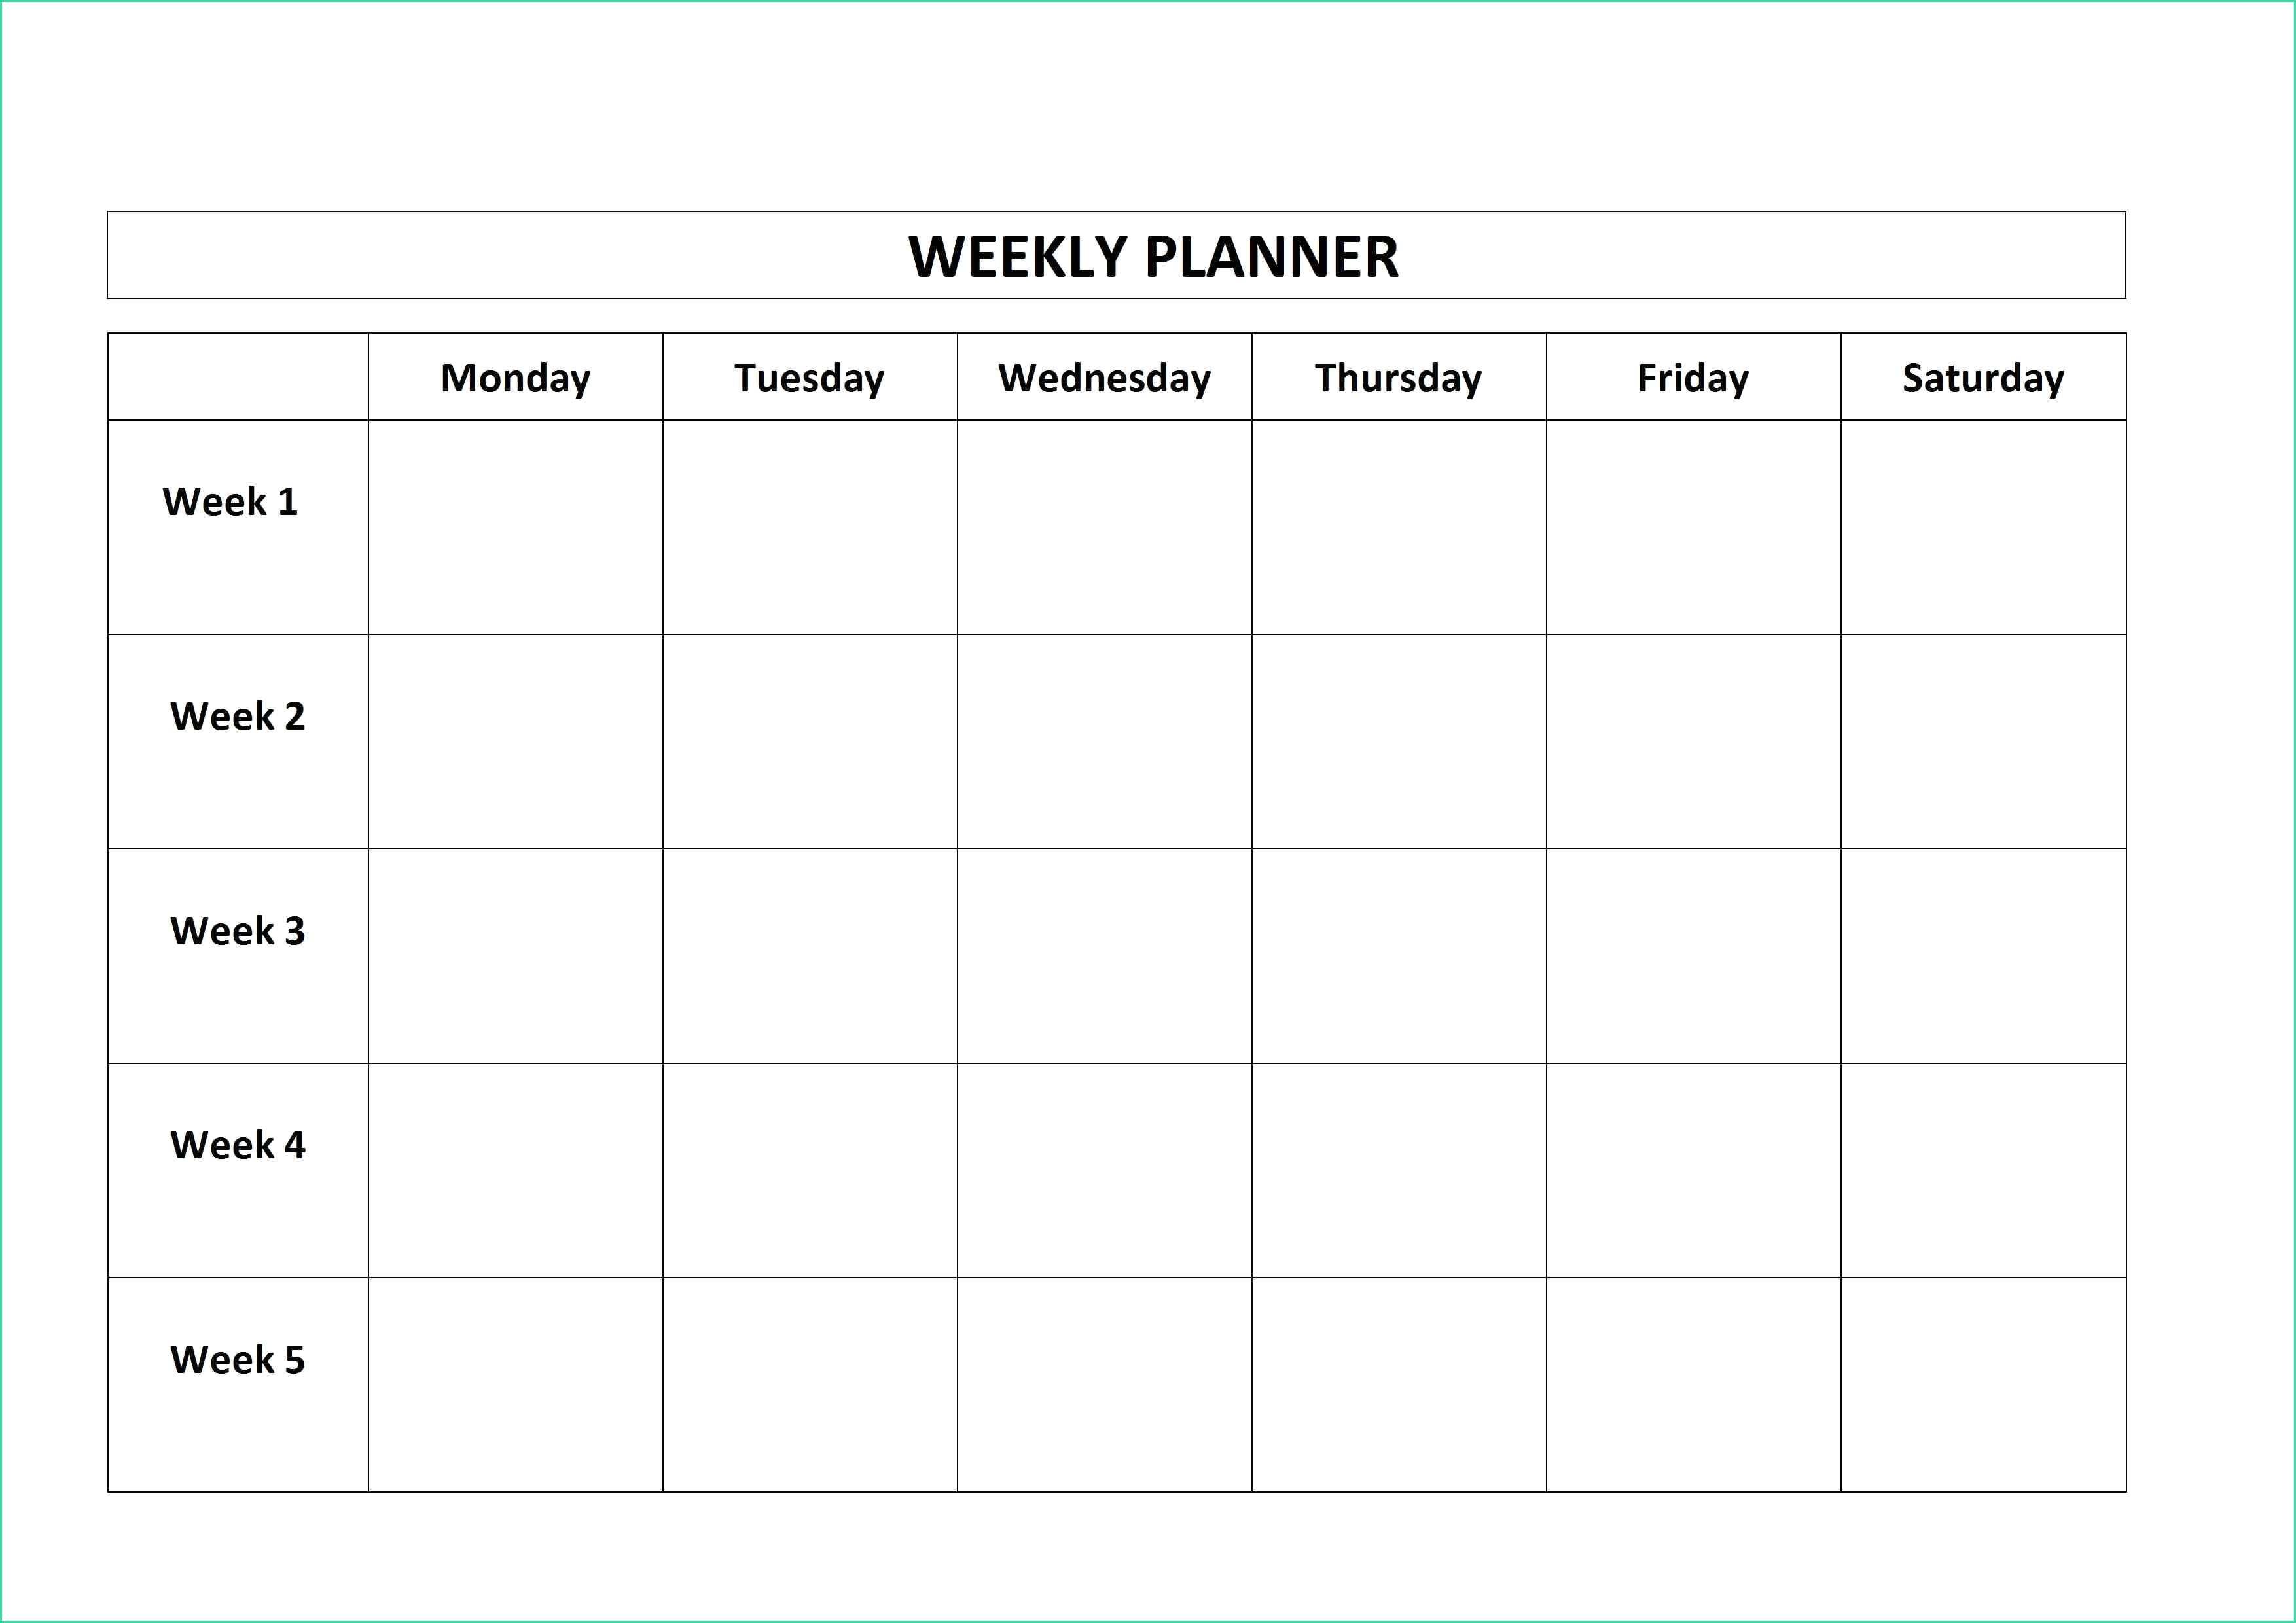 Weekly Calendar Template D Schedule Most Recent Monday